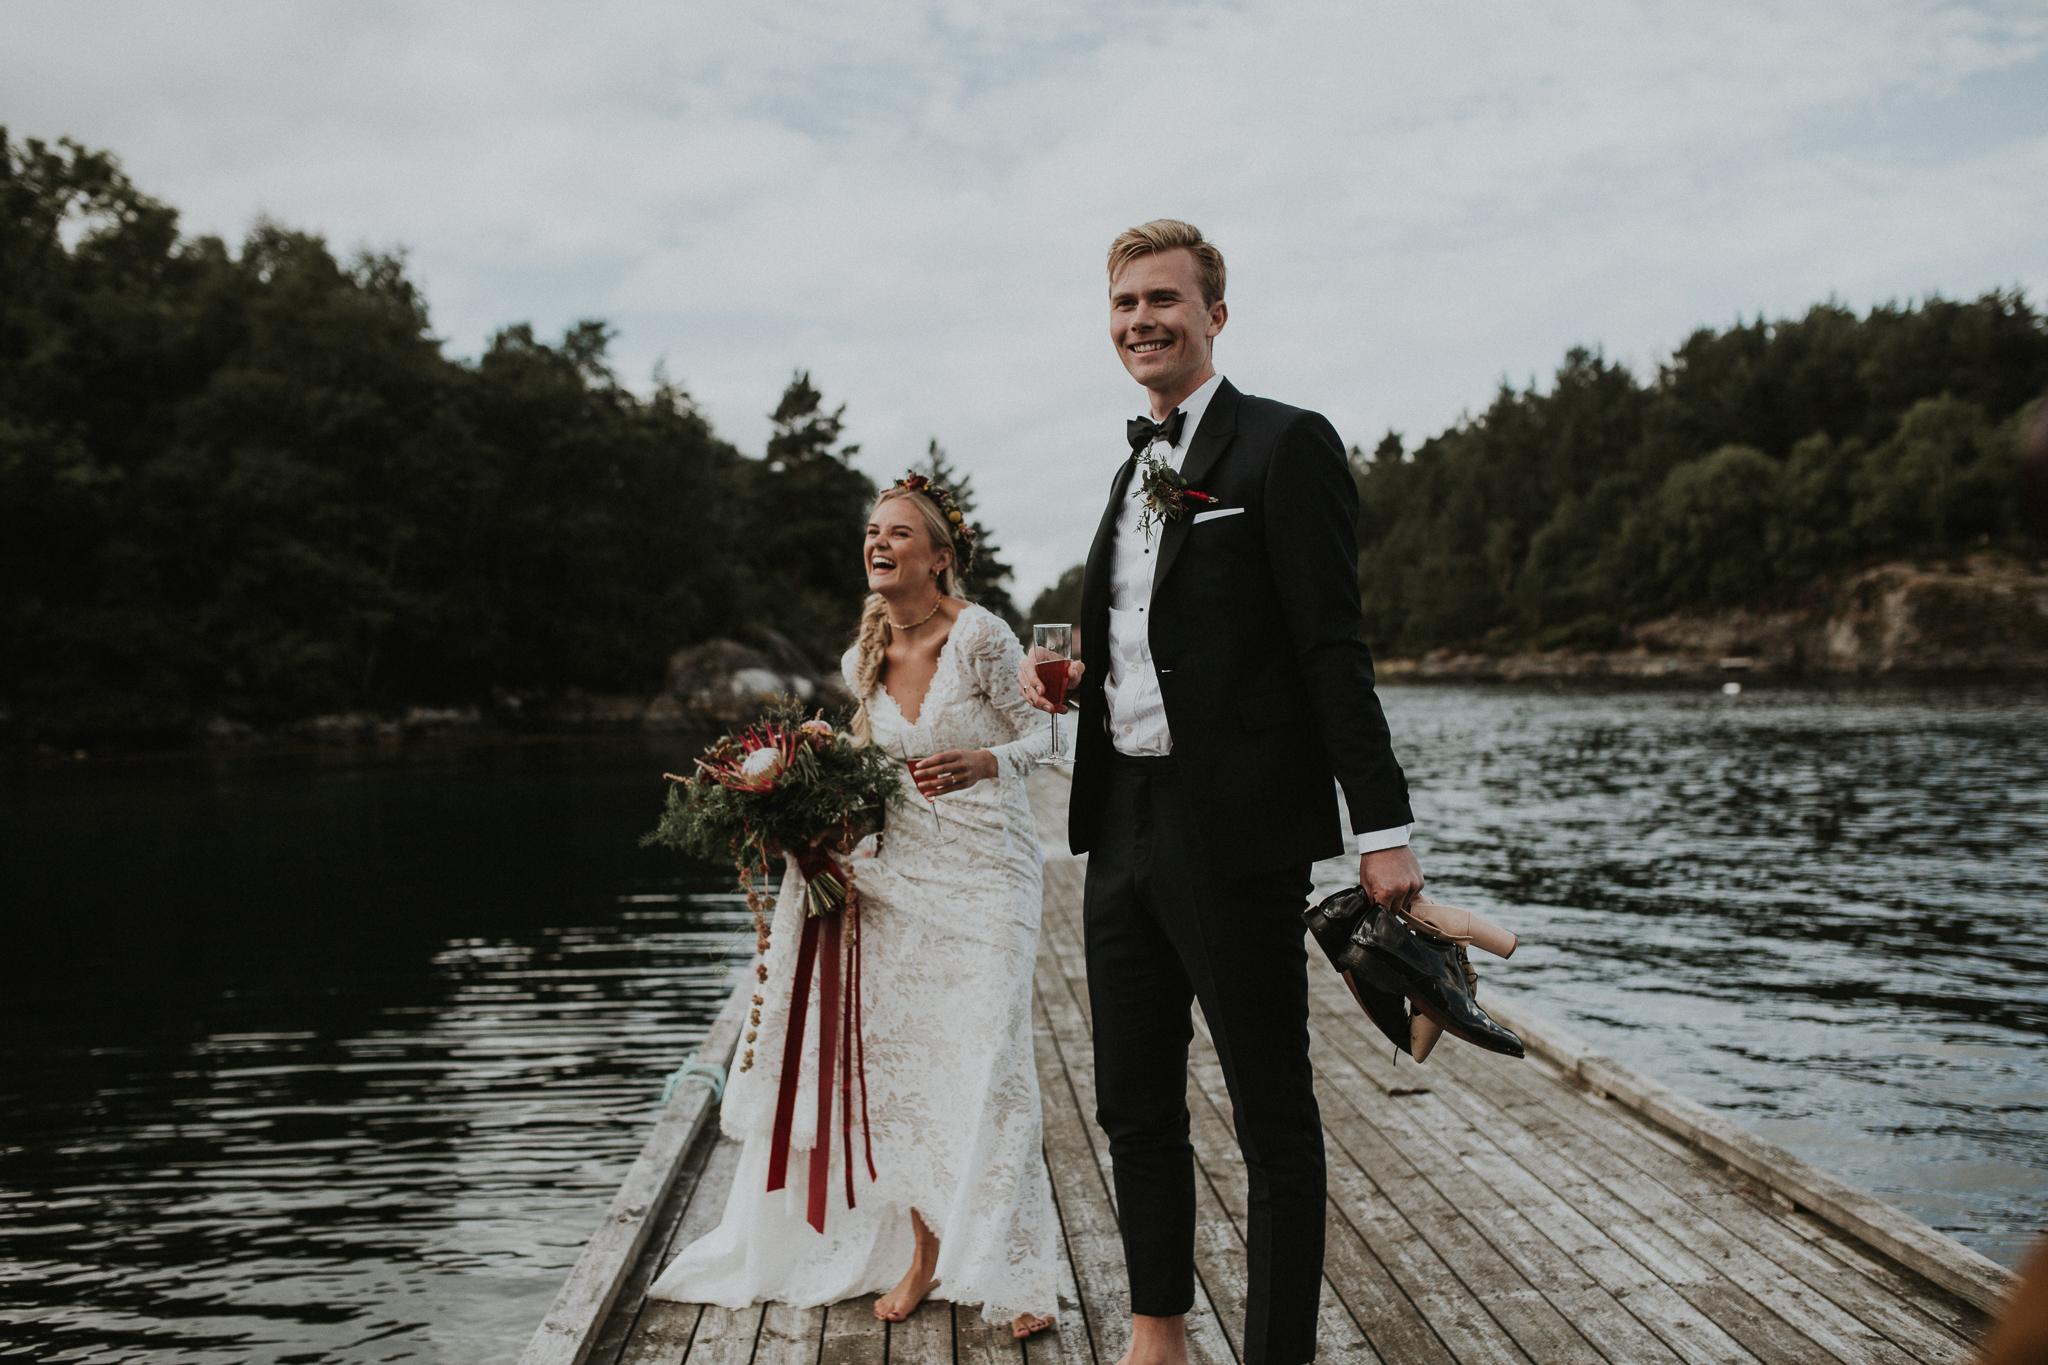 Norway-wedding-photographer-avonne-photography-12.jpg